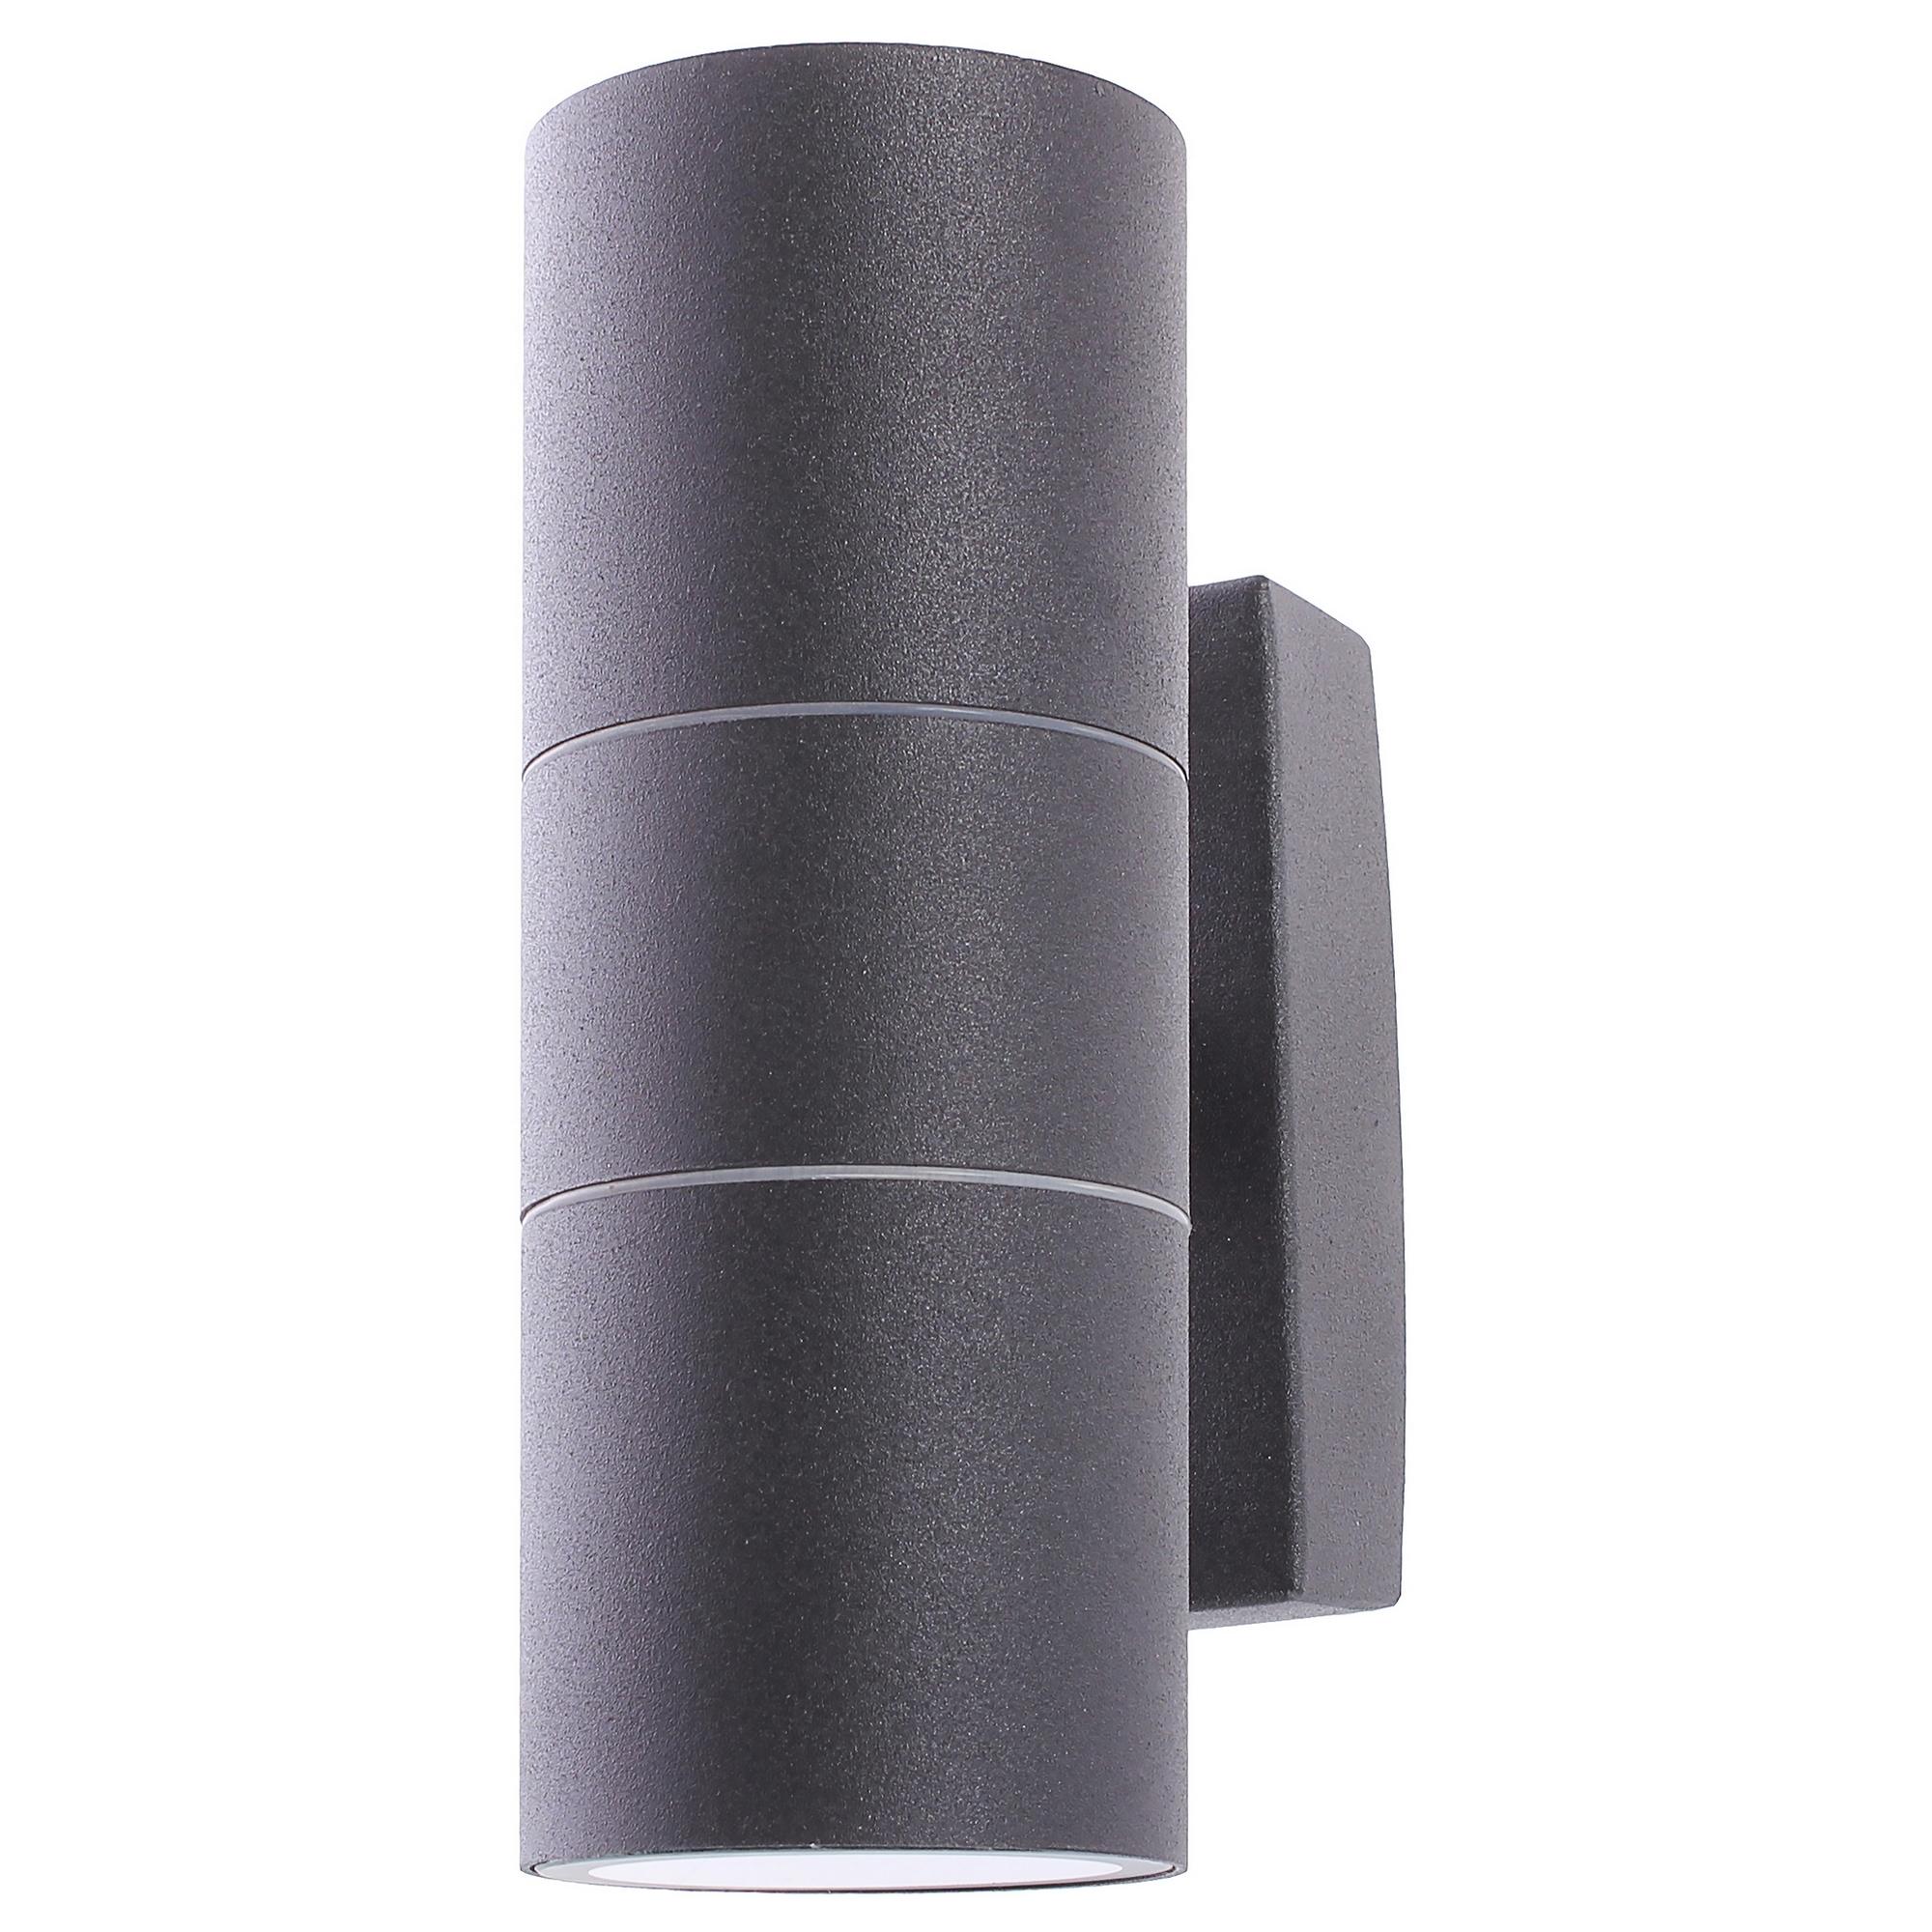 Бра уличное «Mistero» 2хGU10х35 Вт IP44 цвет чёрный металлик